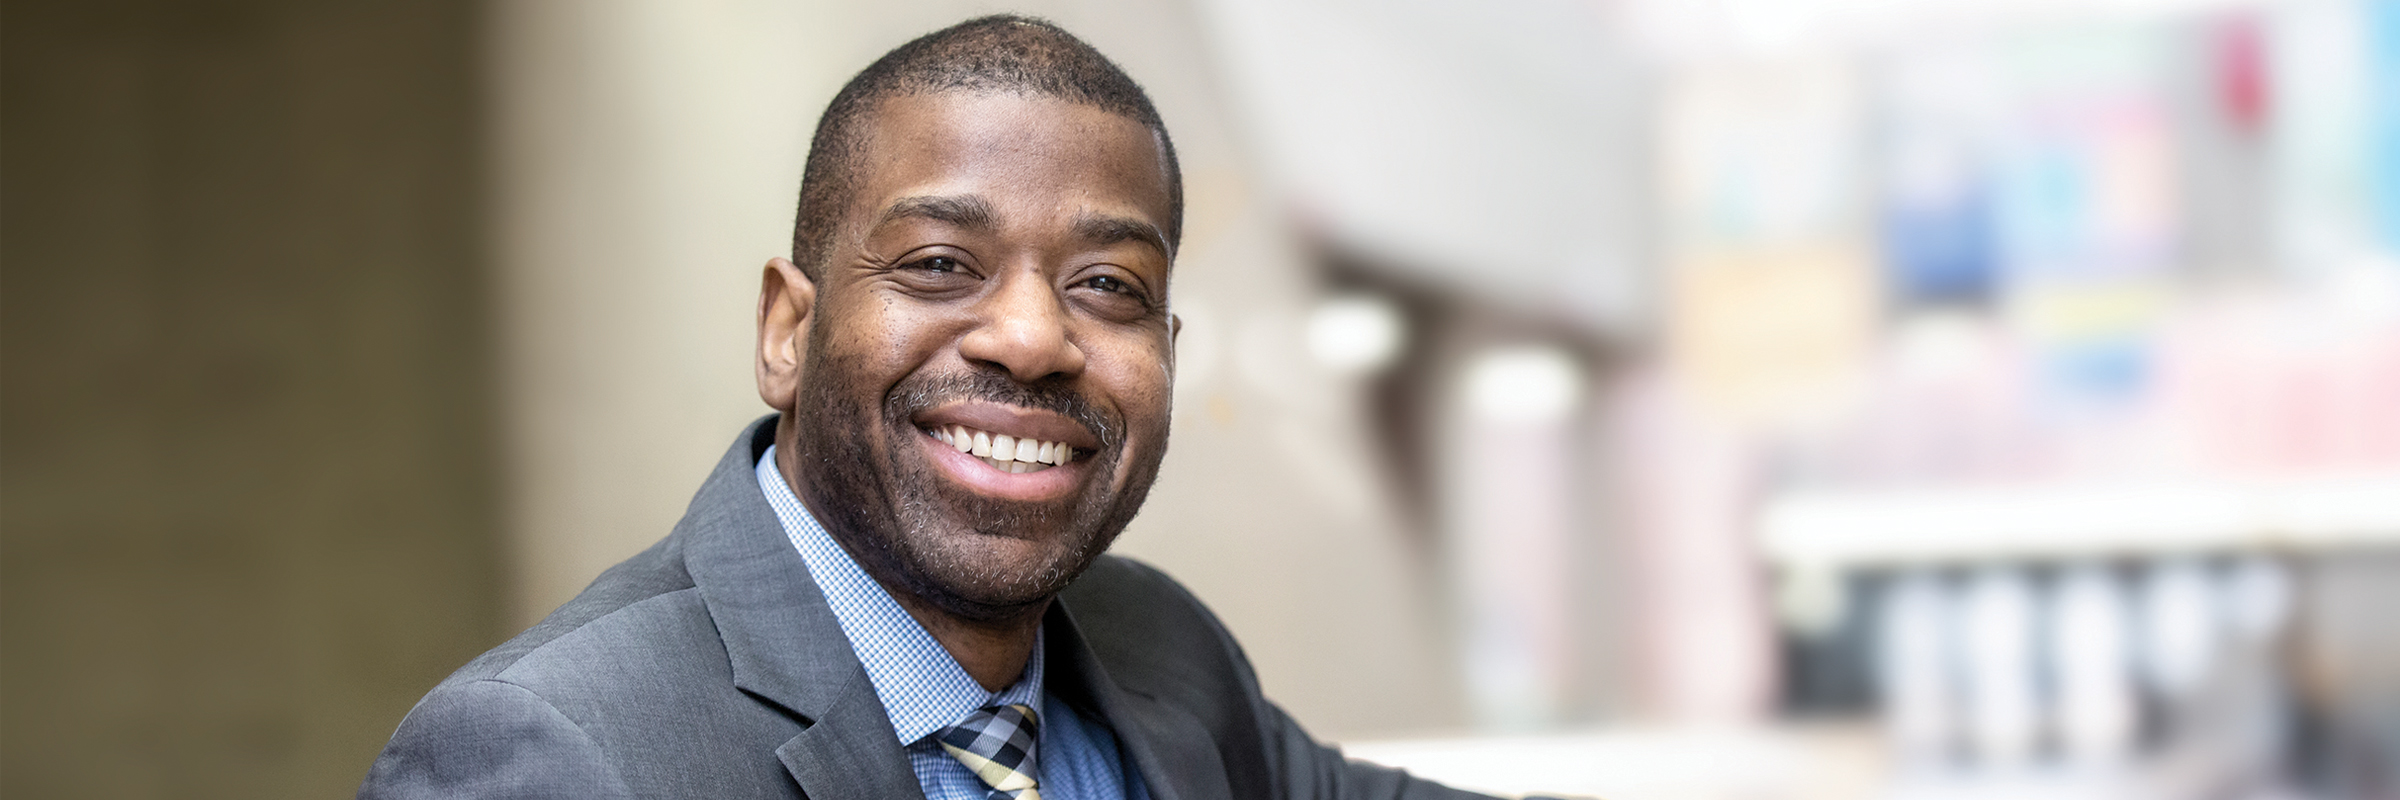 Dr. Marvin Washington